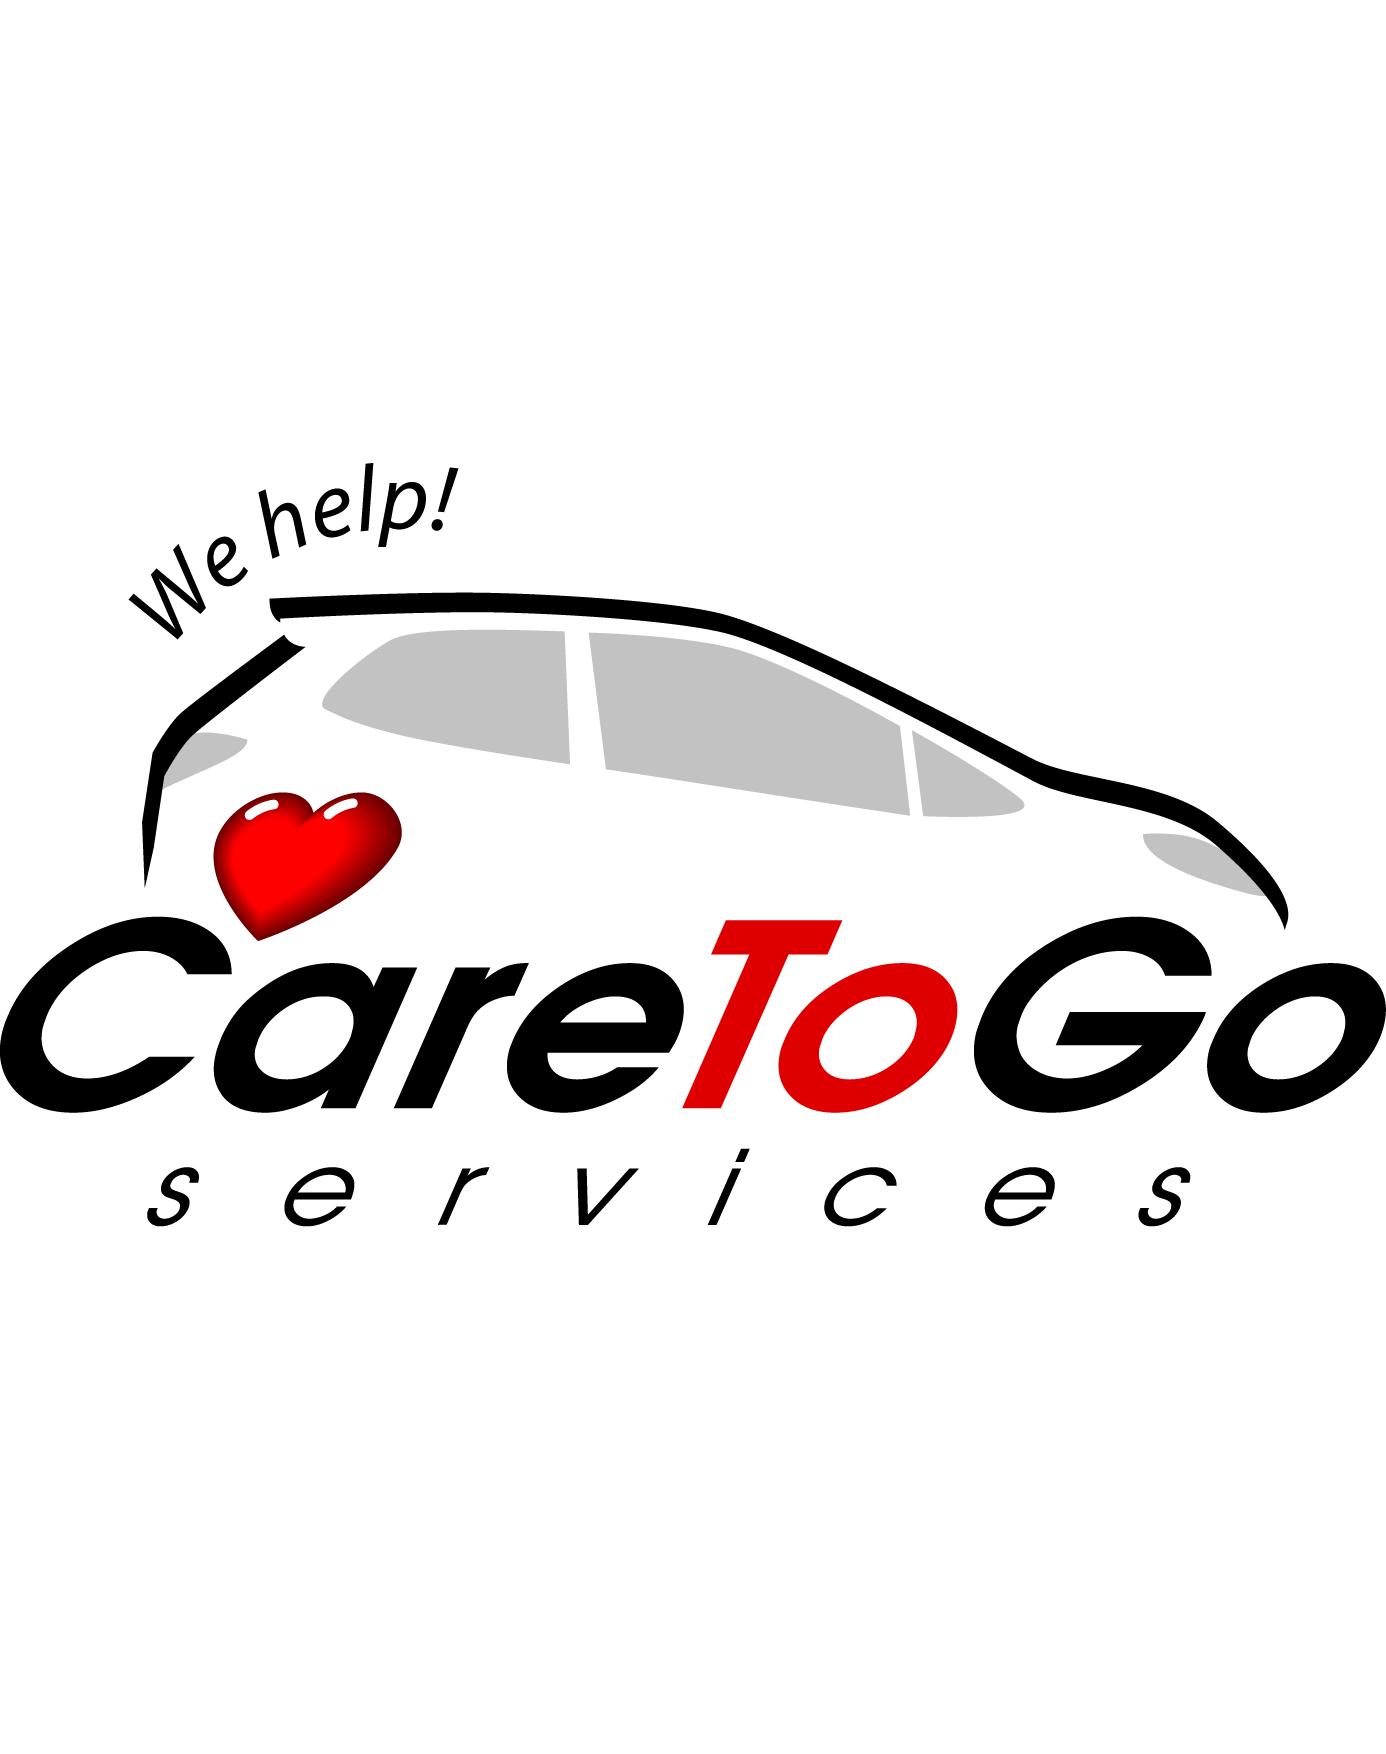 Logo Design by Wilfredo Mendoza - Entry No. 247 in the Logo Design Contest Care To Go Services.